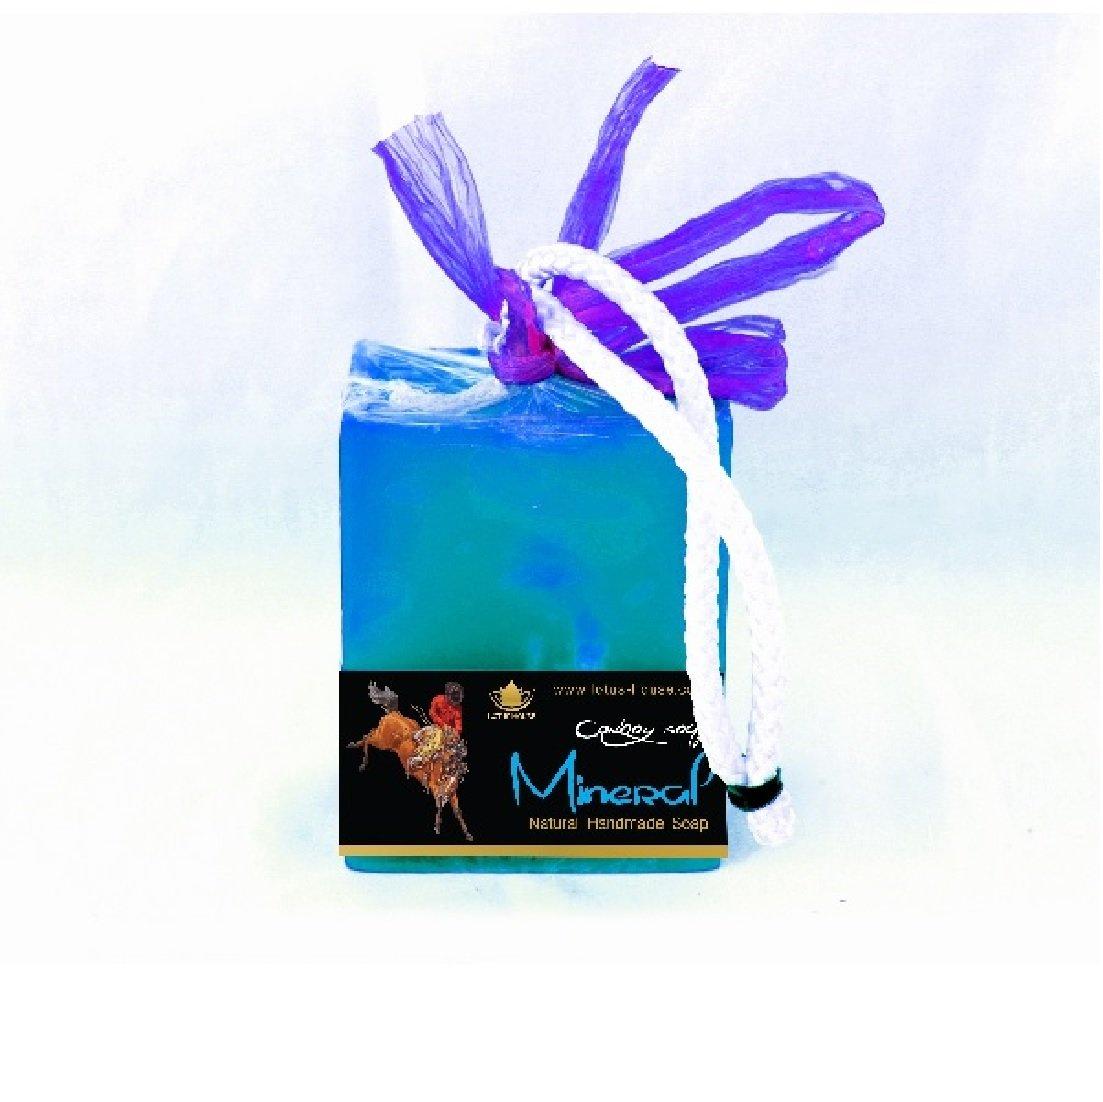 Lotus House Mineral Cowboy Soap - 300gr Bar LH1296